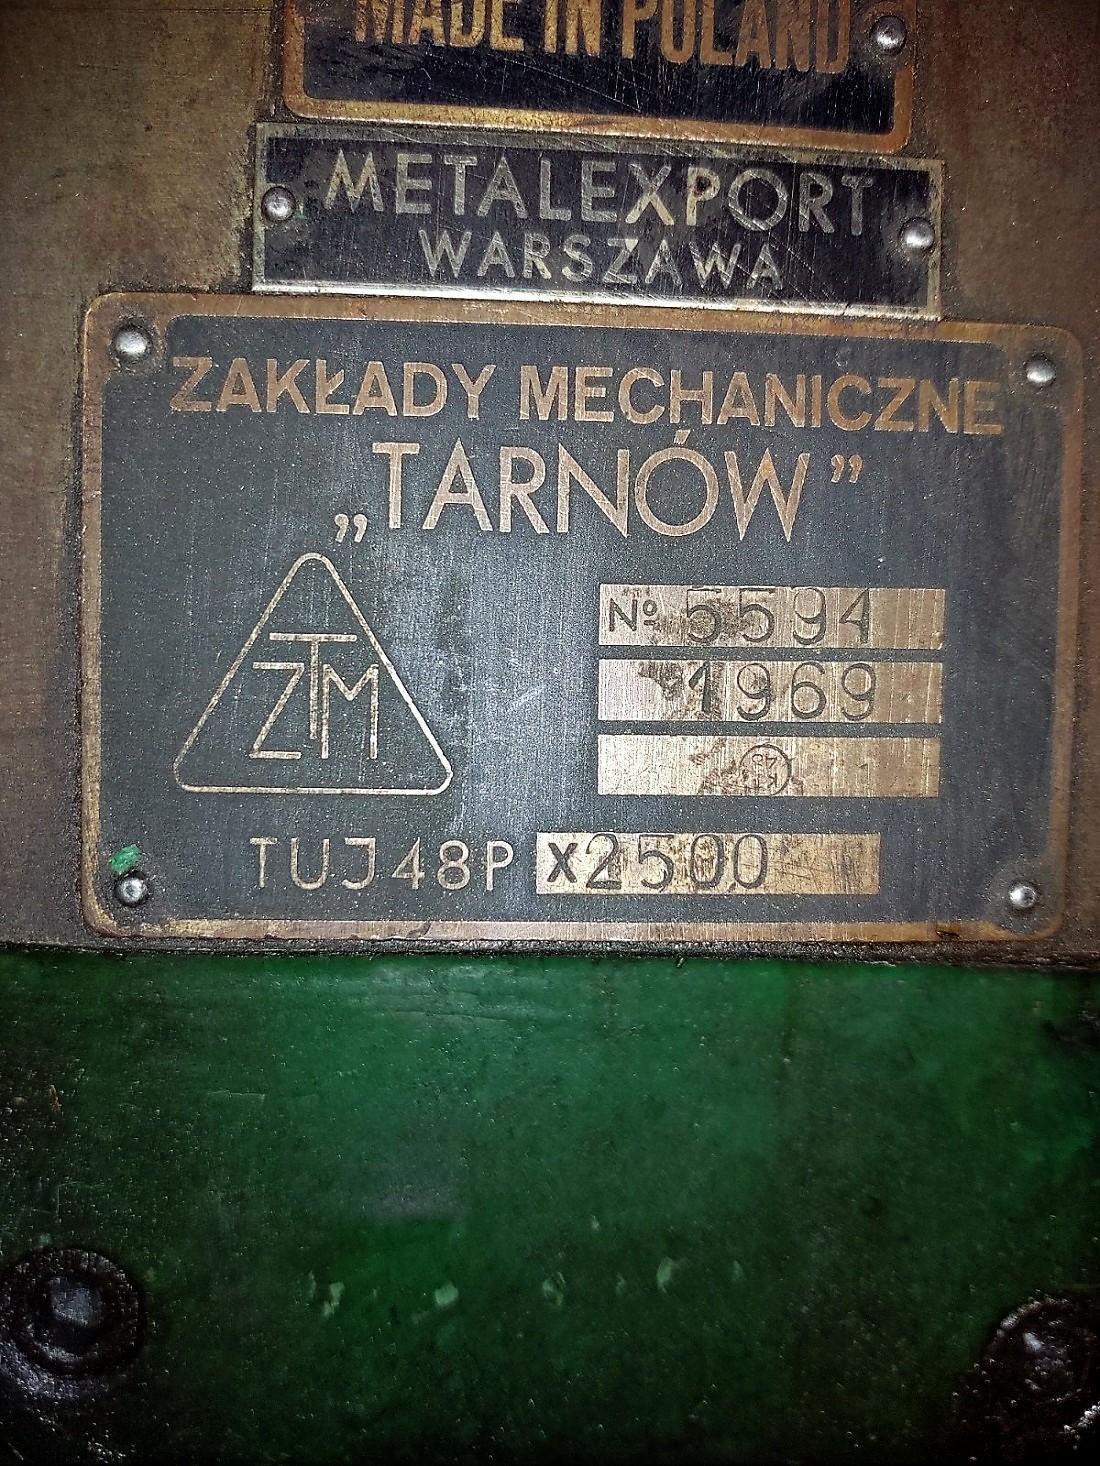 Tarnow Model TUJ 48 Px2500 Gap Bed Engine Lathe